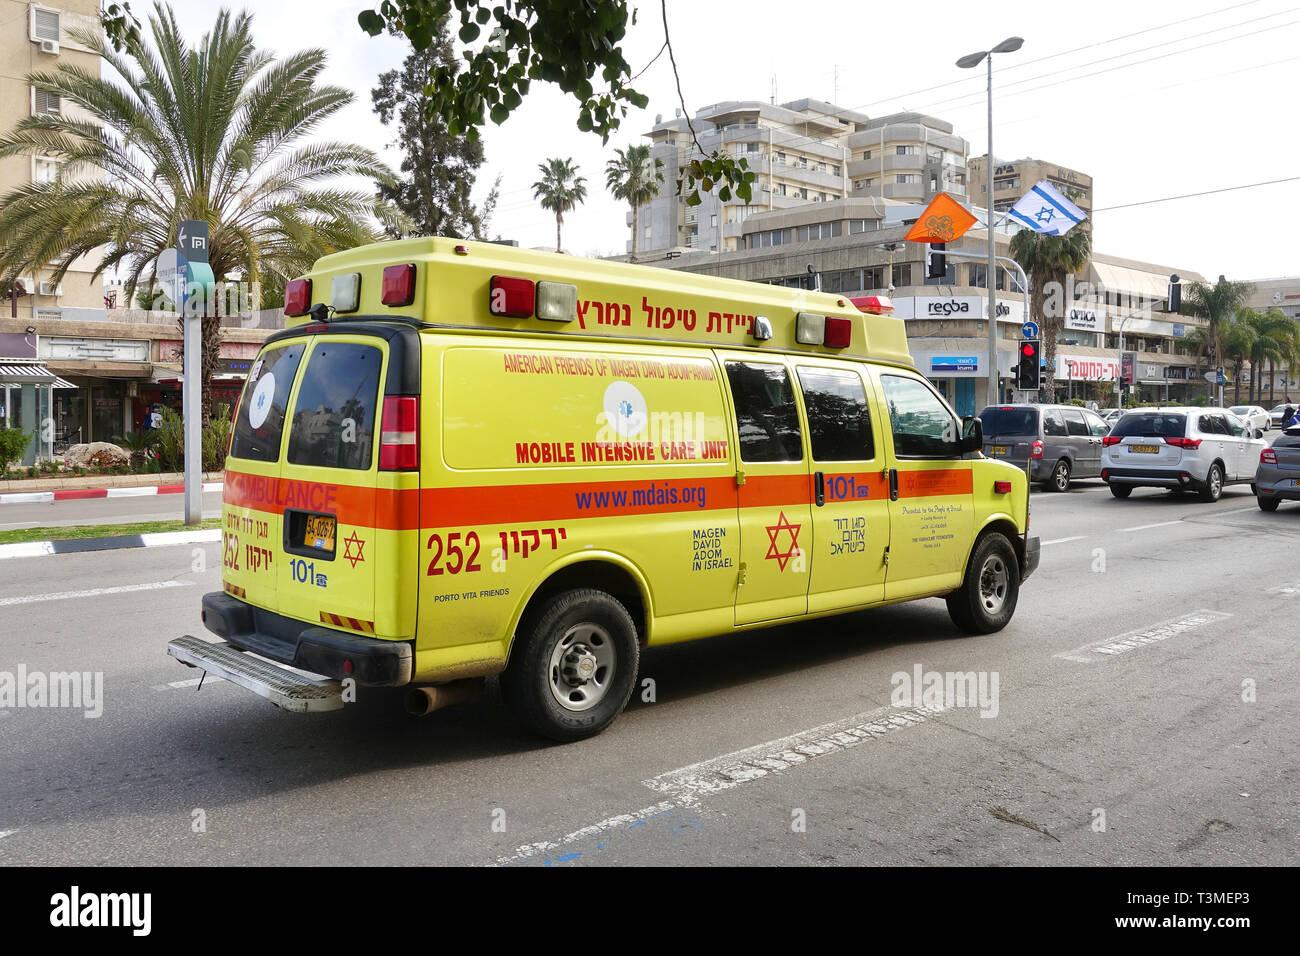 Magen David Adom Ambulance in Israel - Stock Image